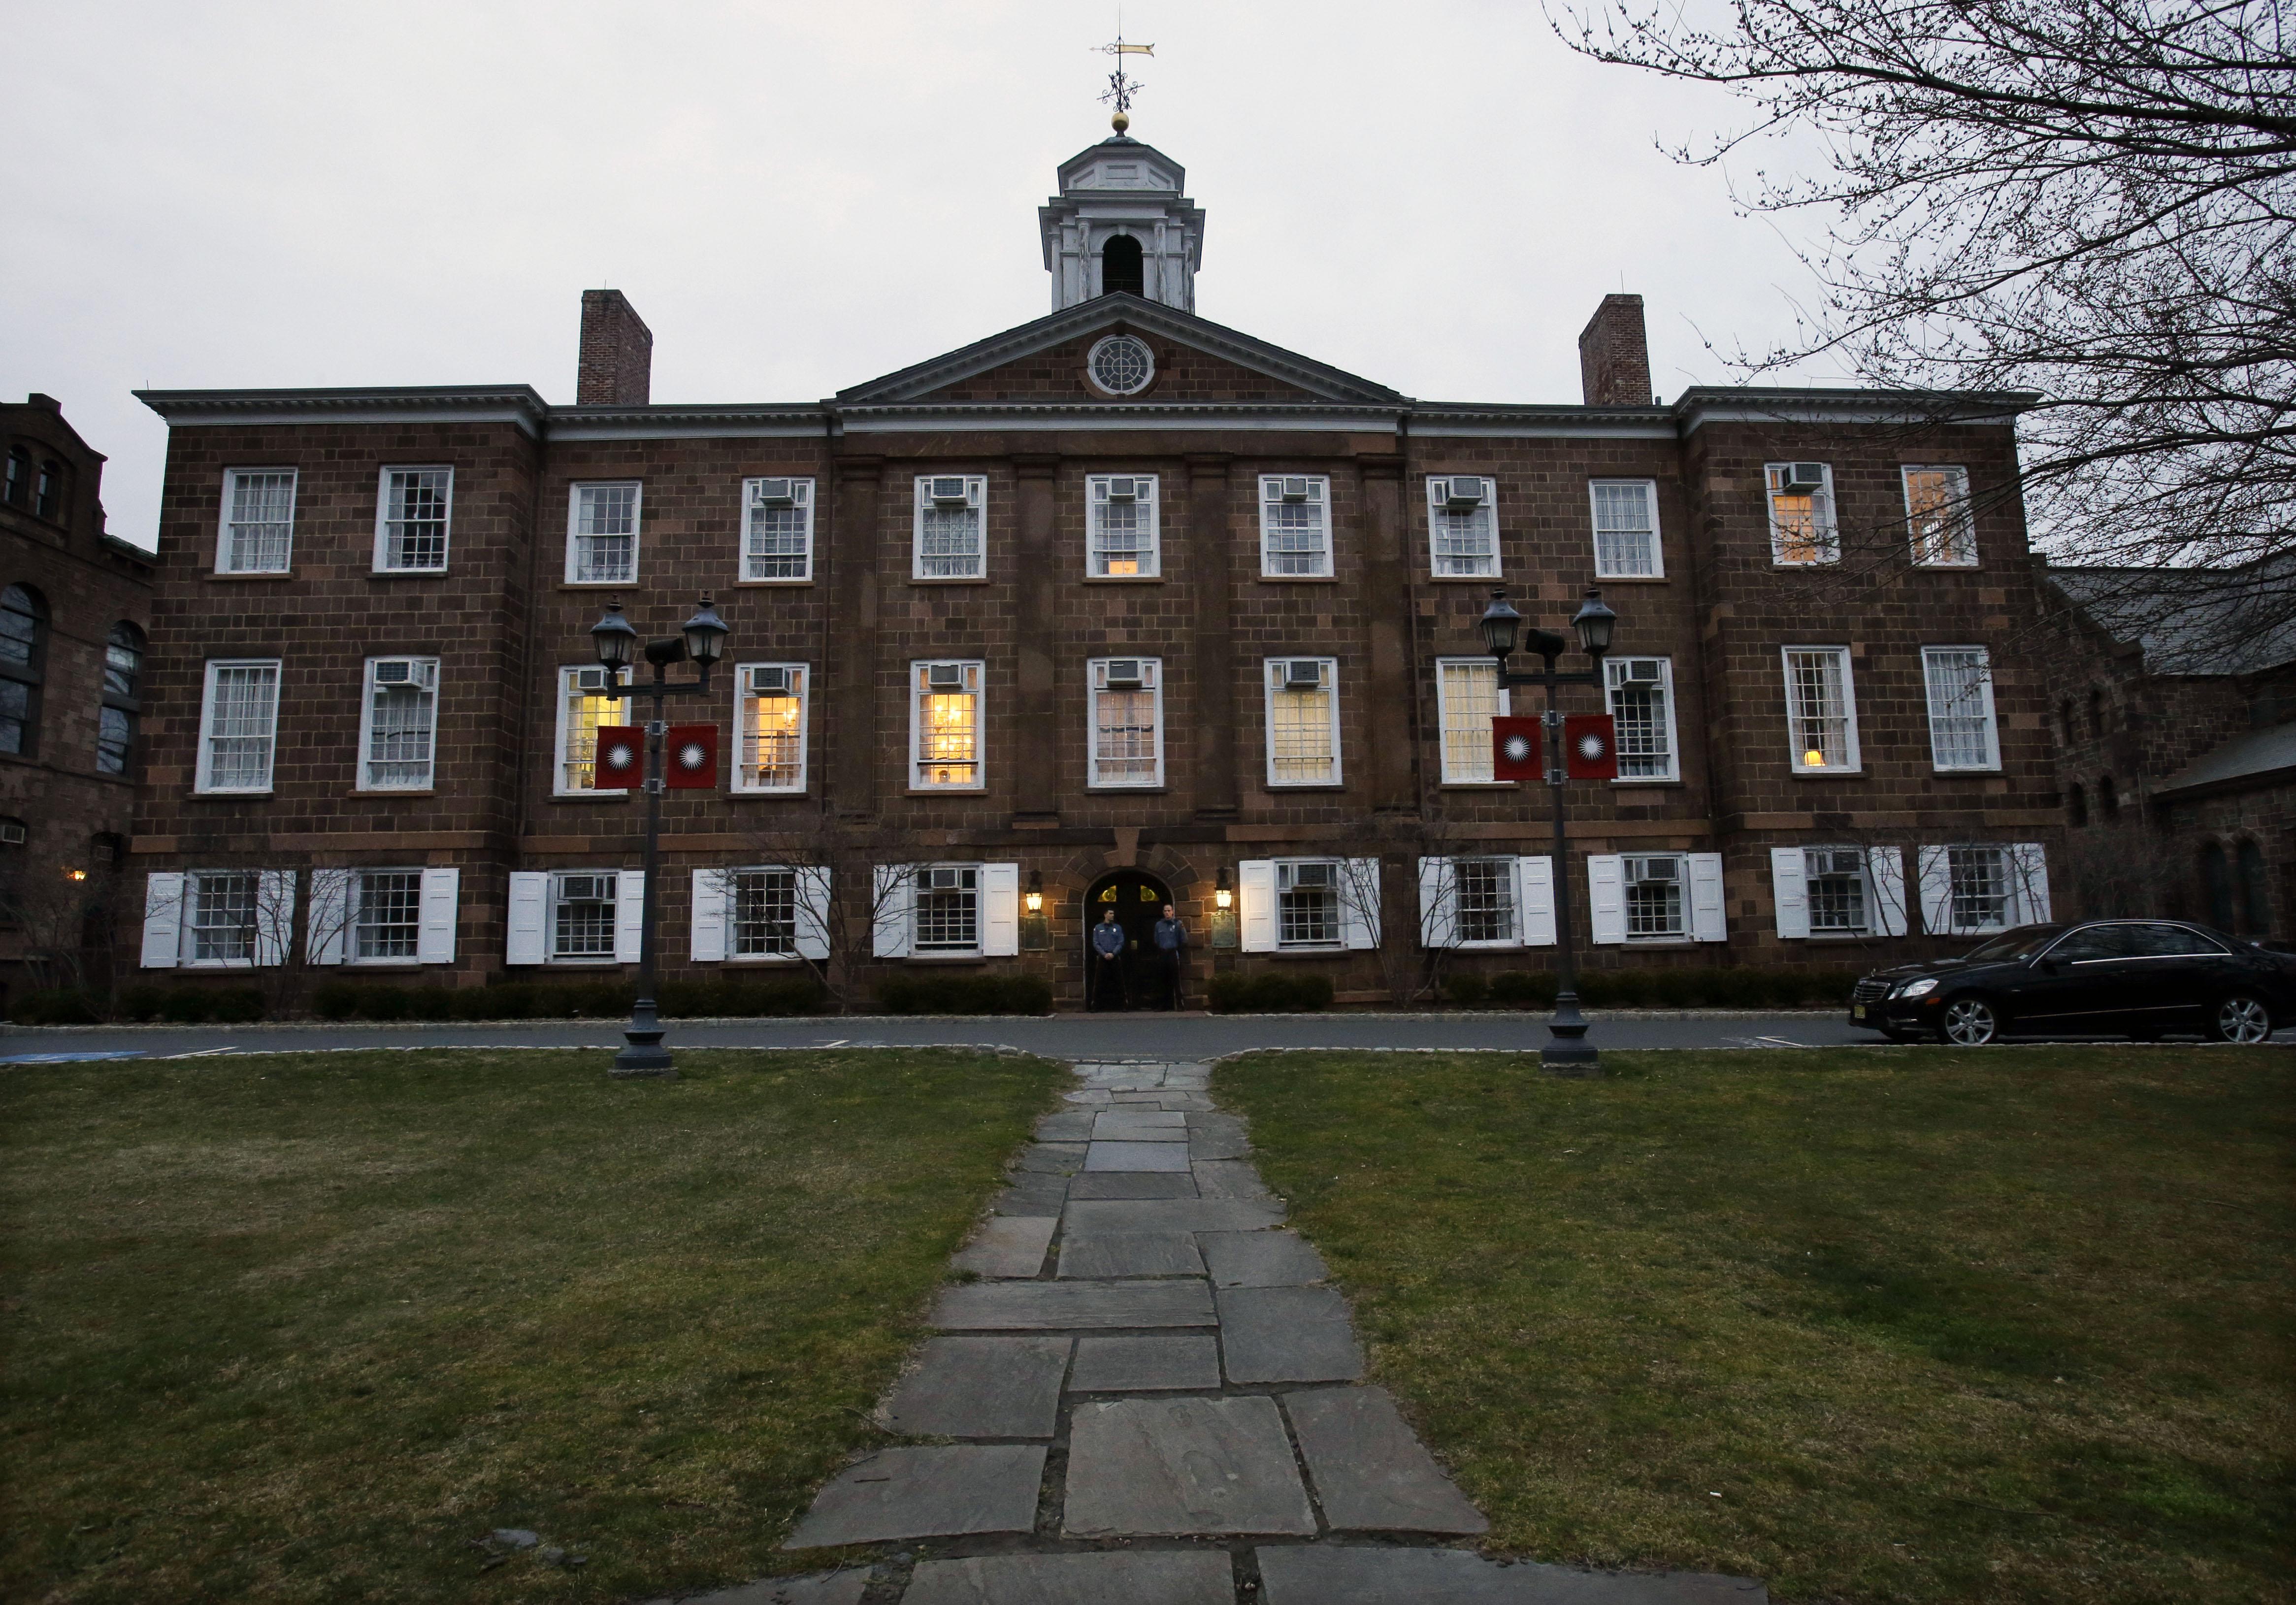 Rutgers University's Old Queens building in 2013, New Brunswick, N.J.